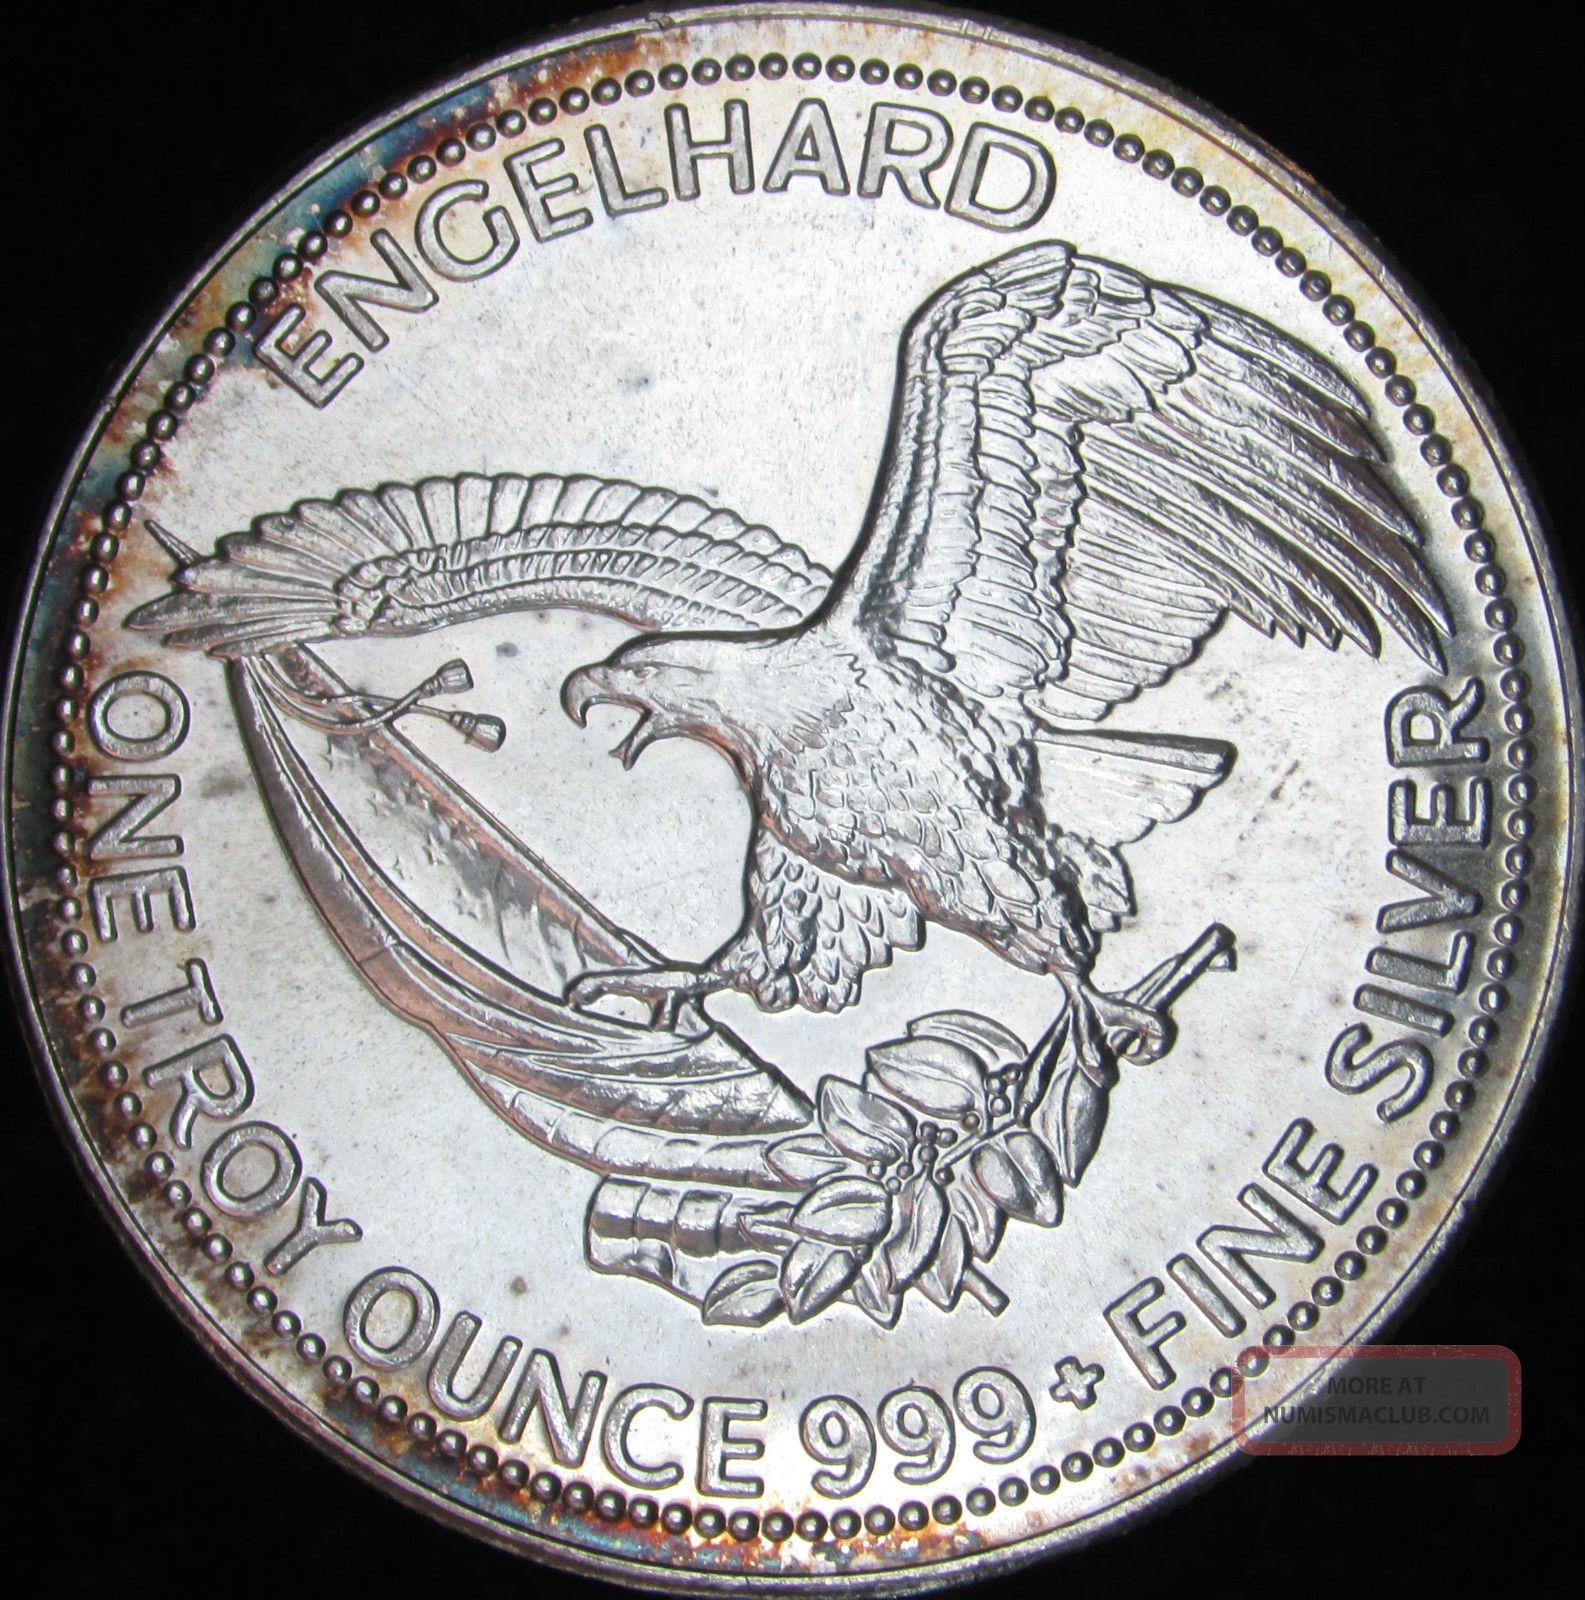 1984 Engelhard 1 Oz Fine Silver The American Prospector